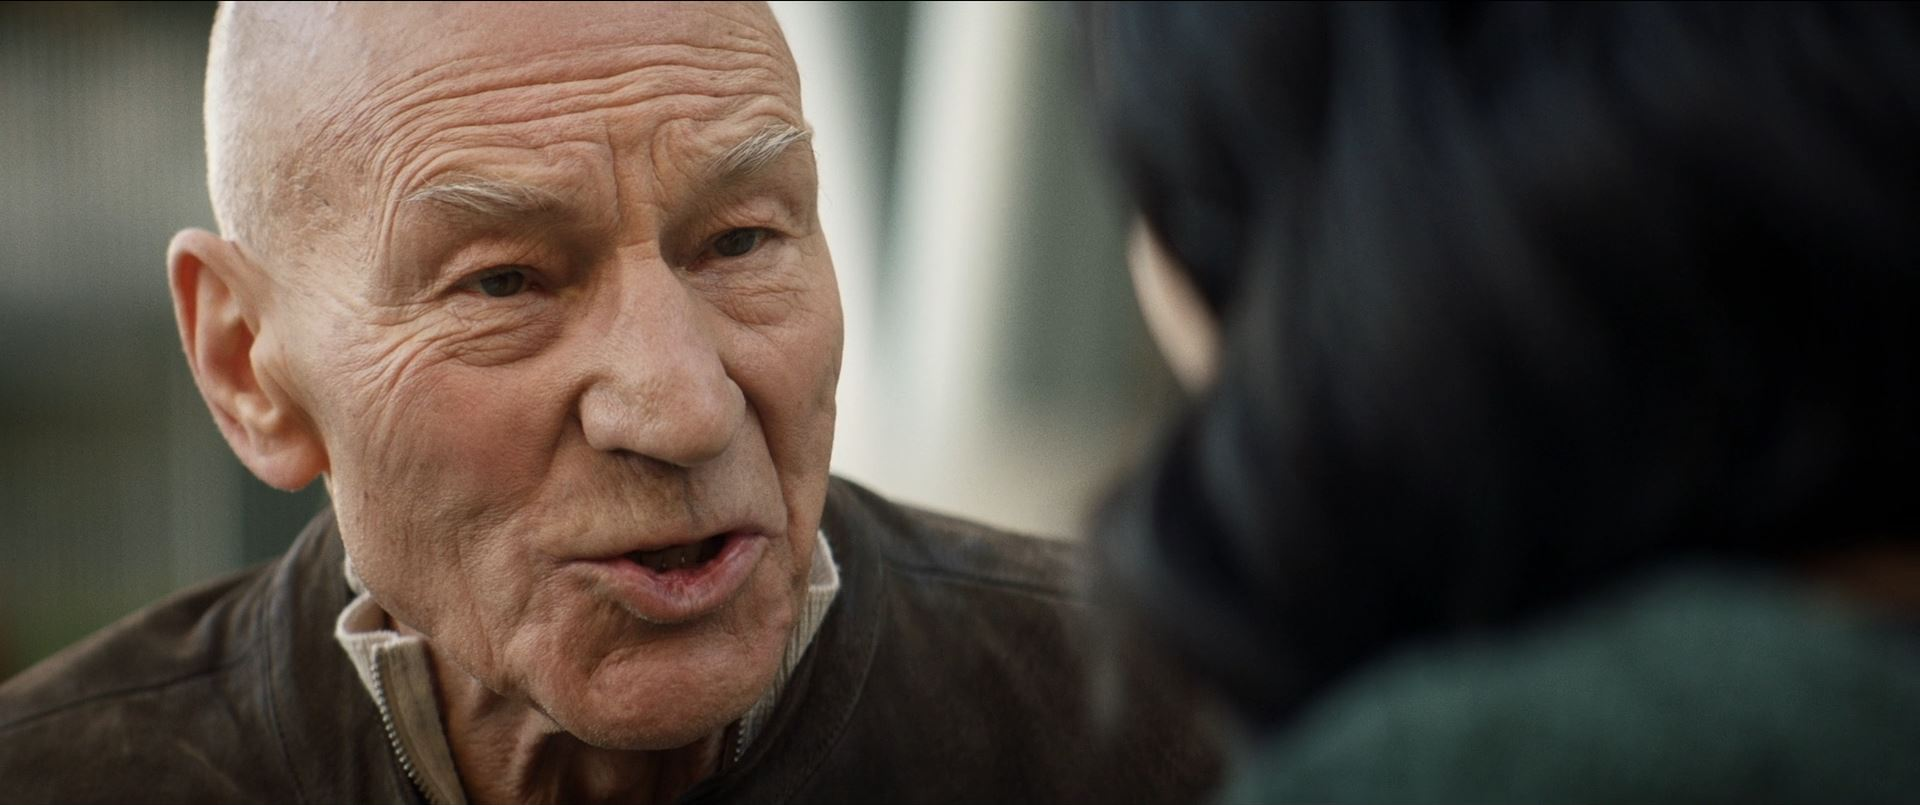 Star Trek Picard - Patrick Stewart as Starfleet Admiral Jean-Luc Picard retired